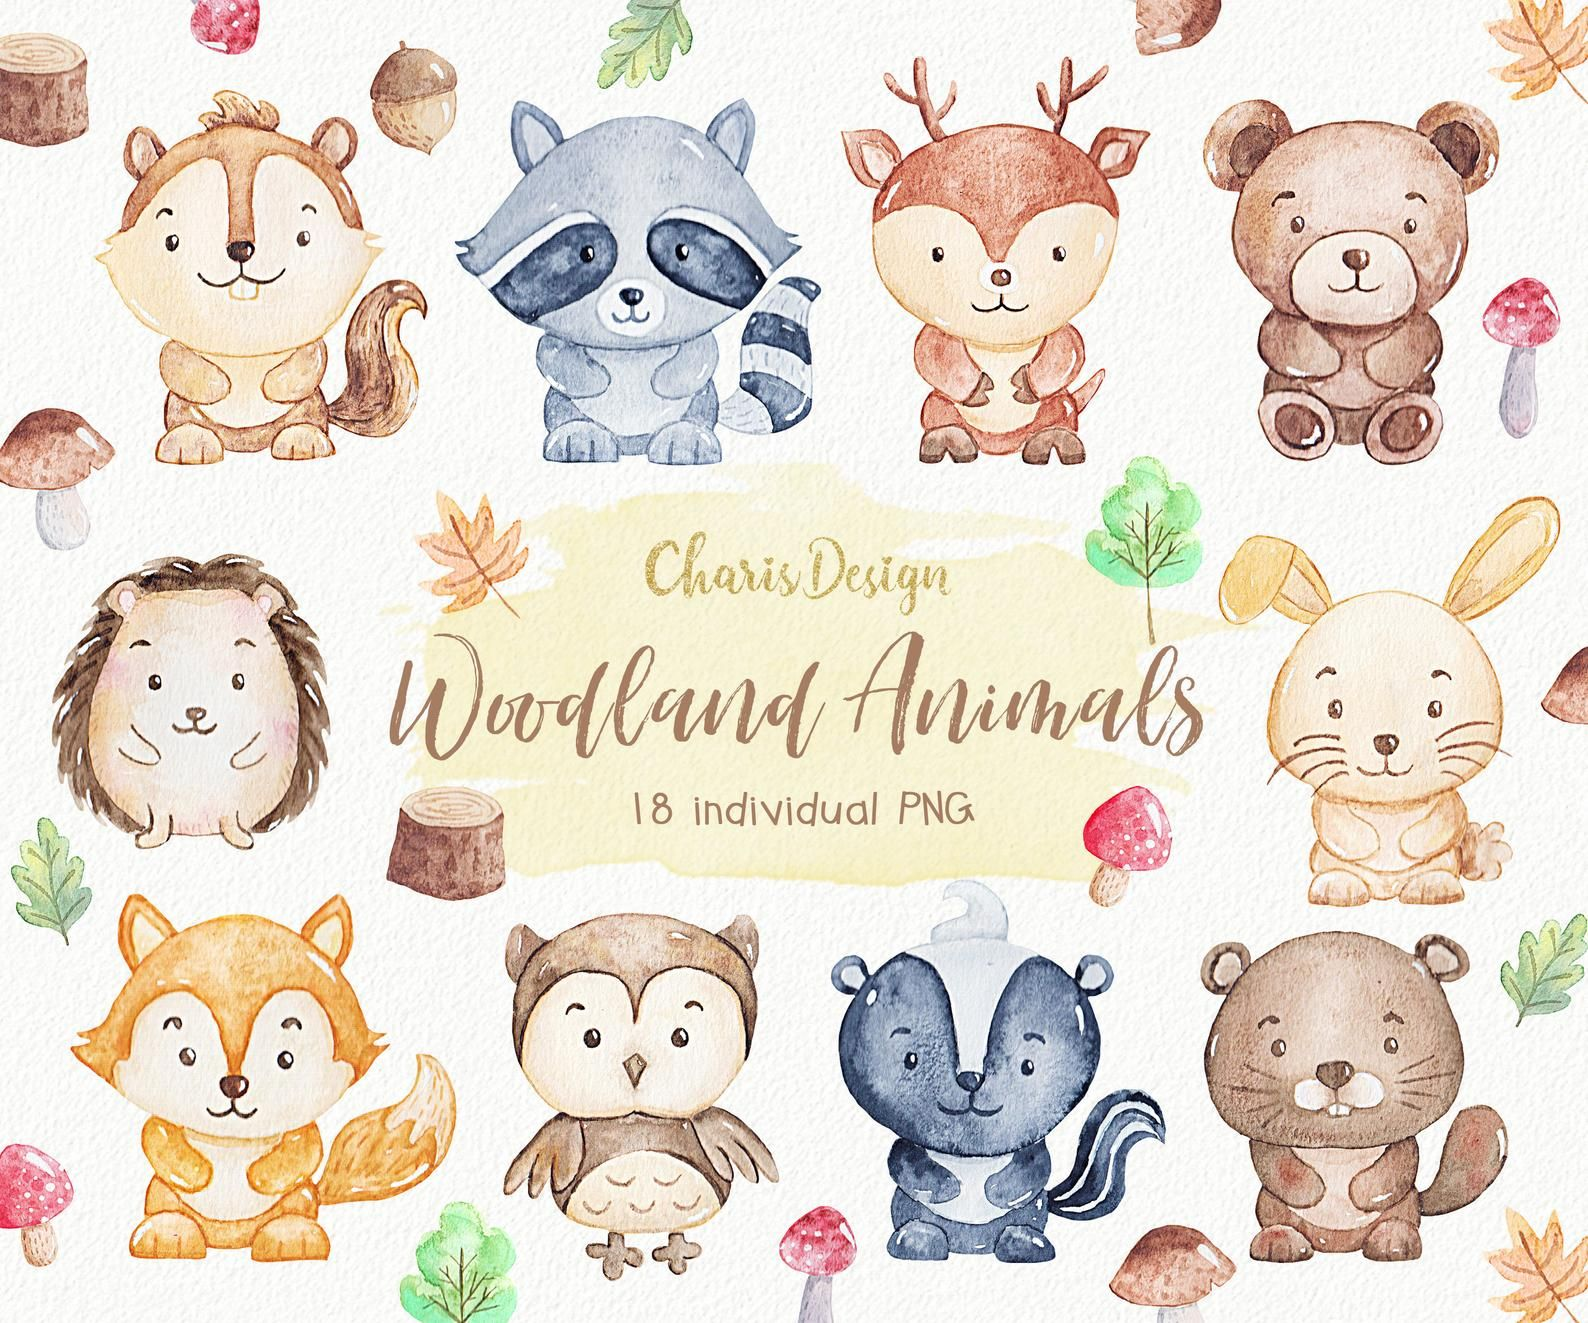 Woodland Animal Illustration Watercolor Clipart Nursery Forest Cute Baby Squirrel Raccoon Deer Fox Owl Bunny Hedgedog Skunk Beaver Bear Animais De Aquarela Ilustracoes Bichinhos Fofos